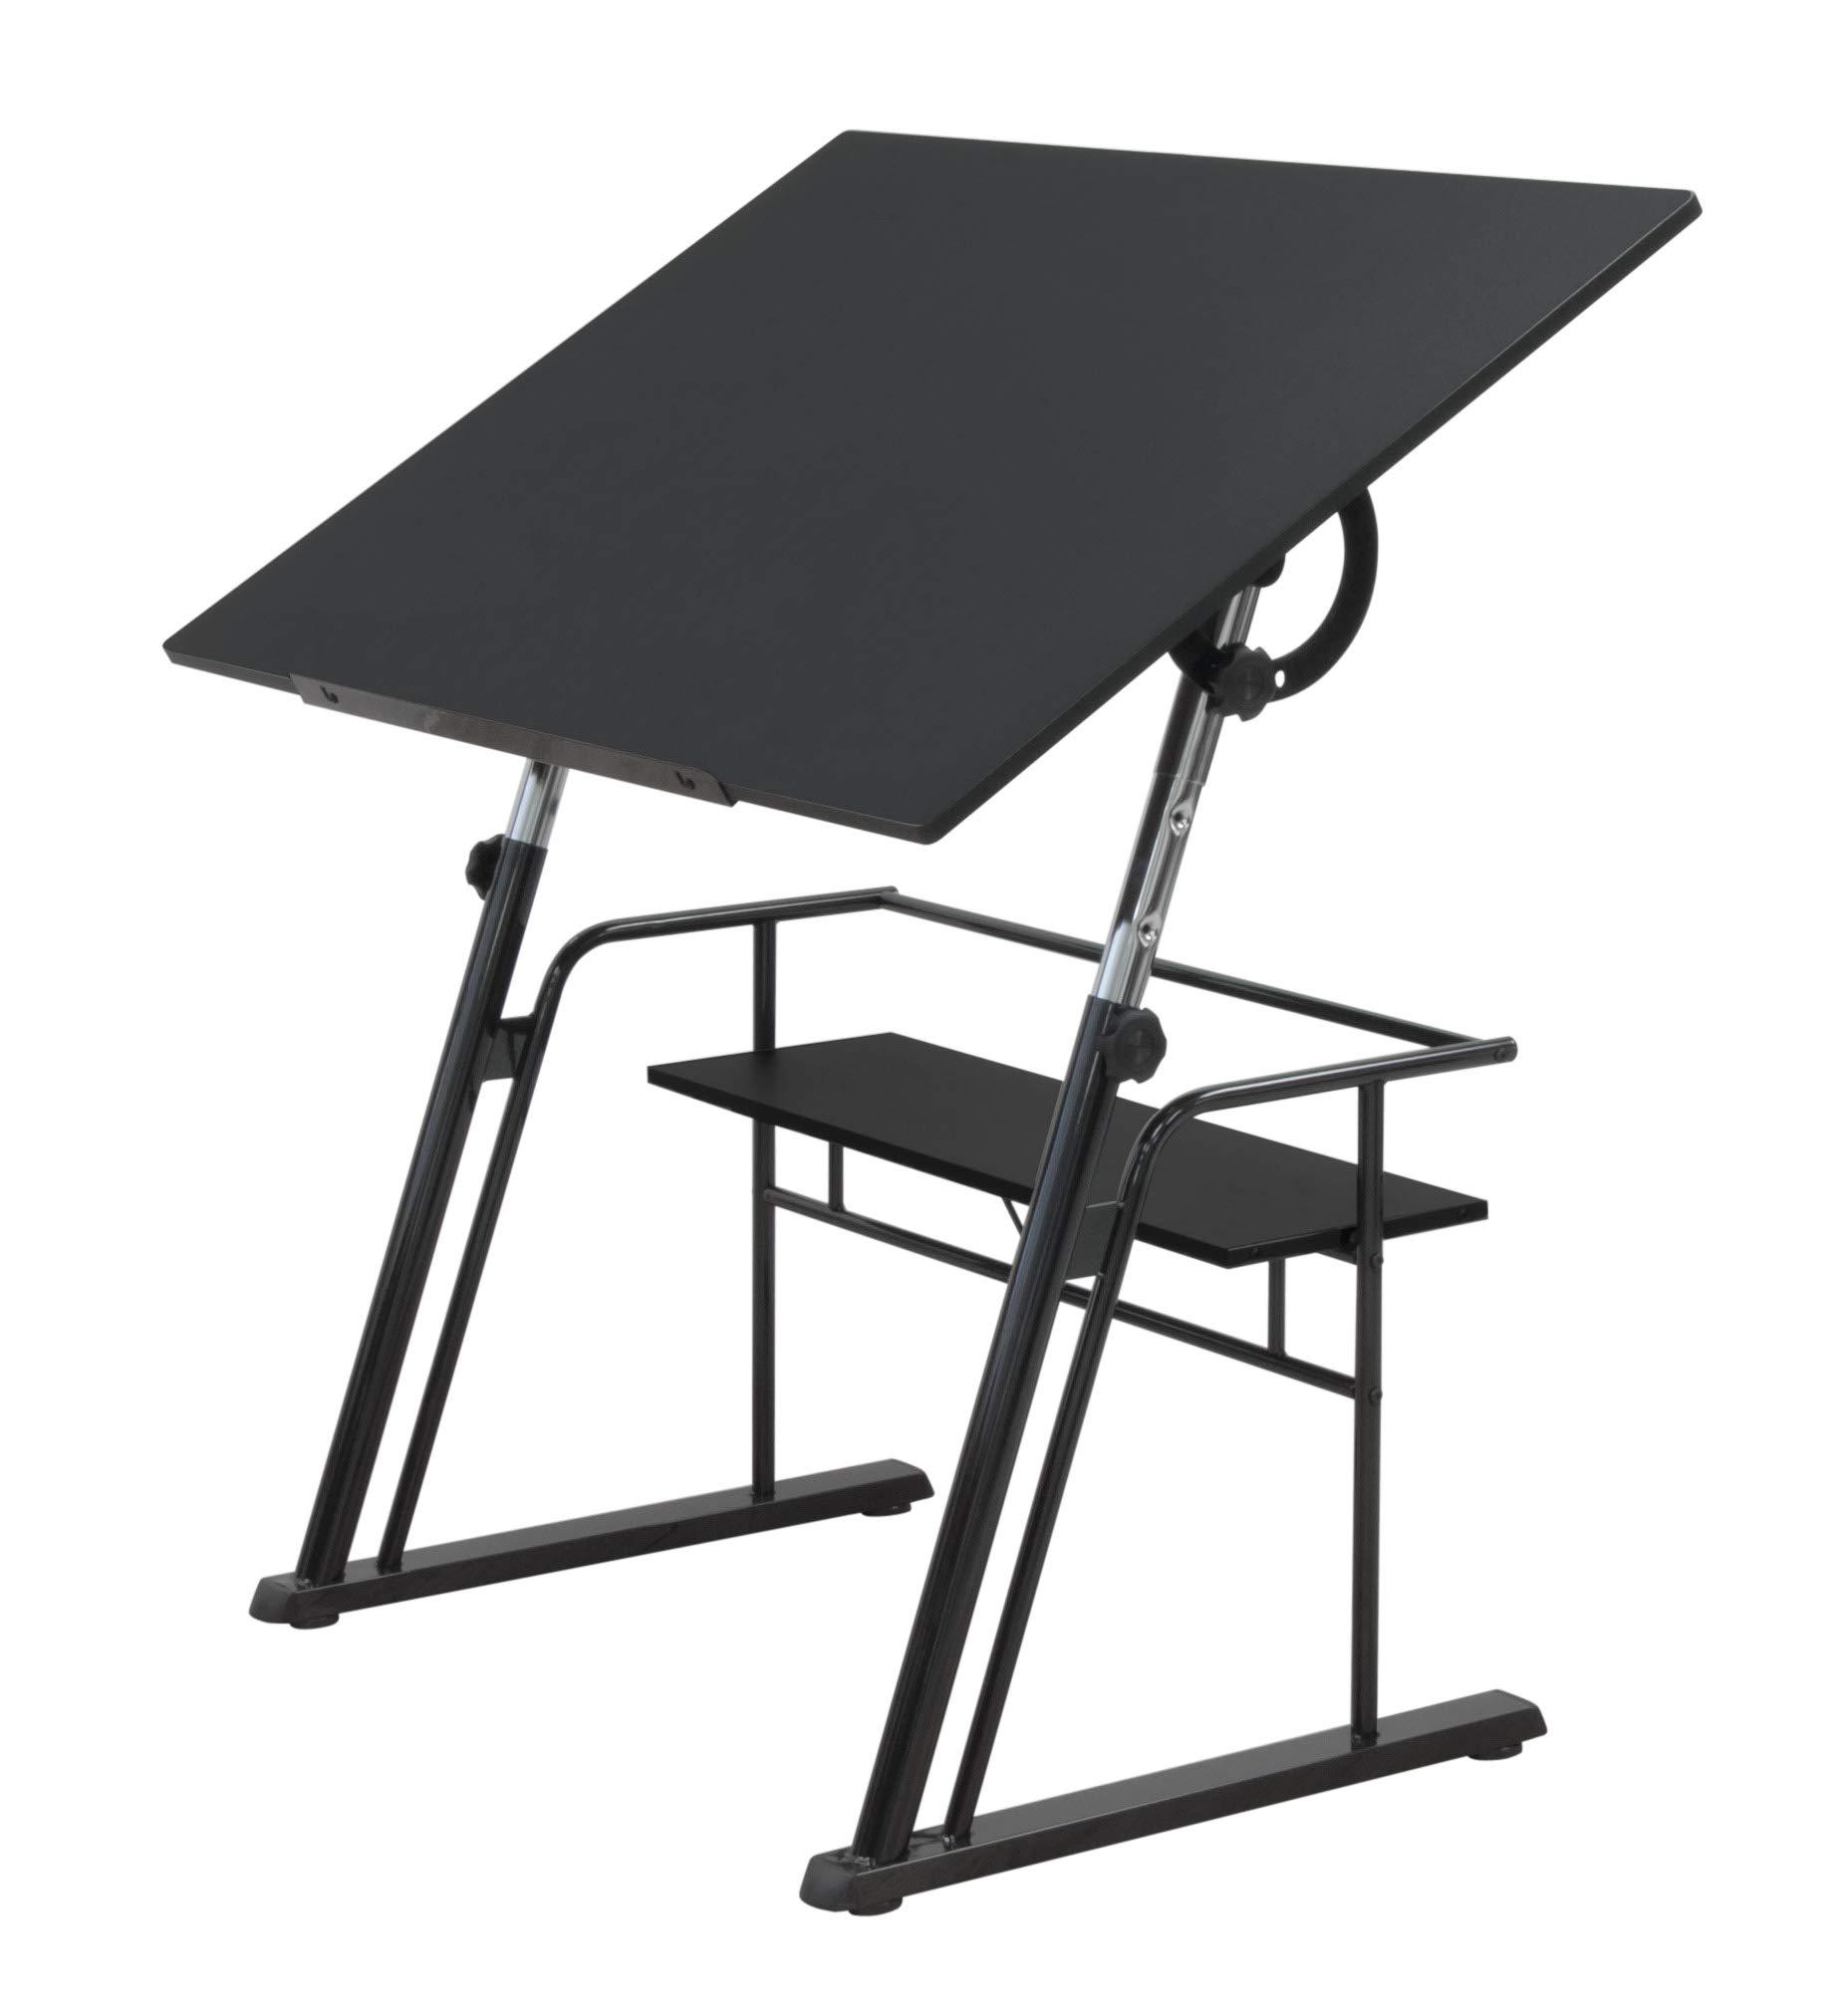 STUDIO DESIGNS Zenith Craft Desk Drafting Table, Top Adjustable Drafting Table Craft Table Drawing Desk Hobby Table Writing Desk Studio Desk, Black, 13340 by SD STUDIO DESIGNS